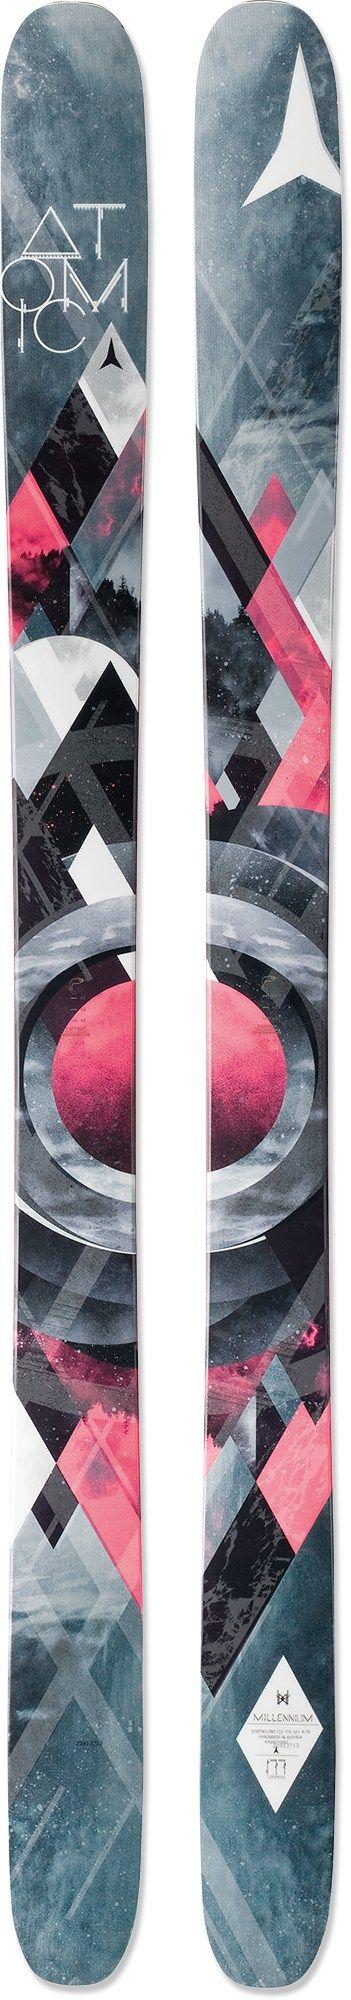 Atomic Millennium Skis - Women's - 2013/2014 - REI.com